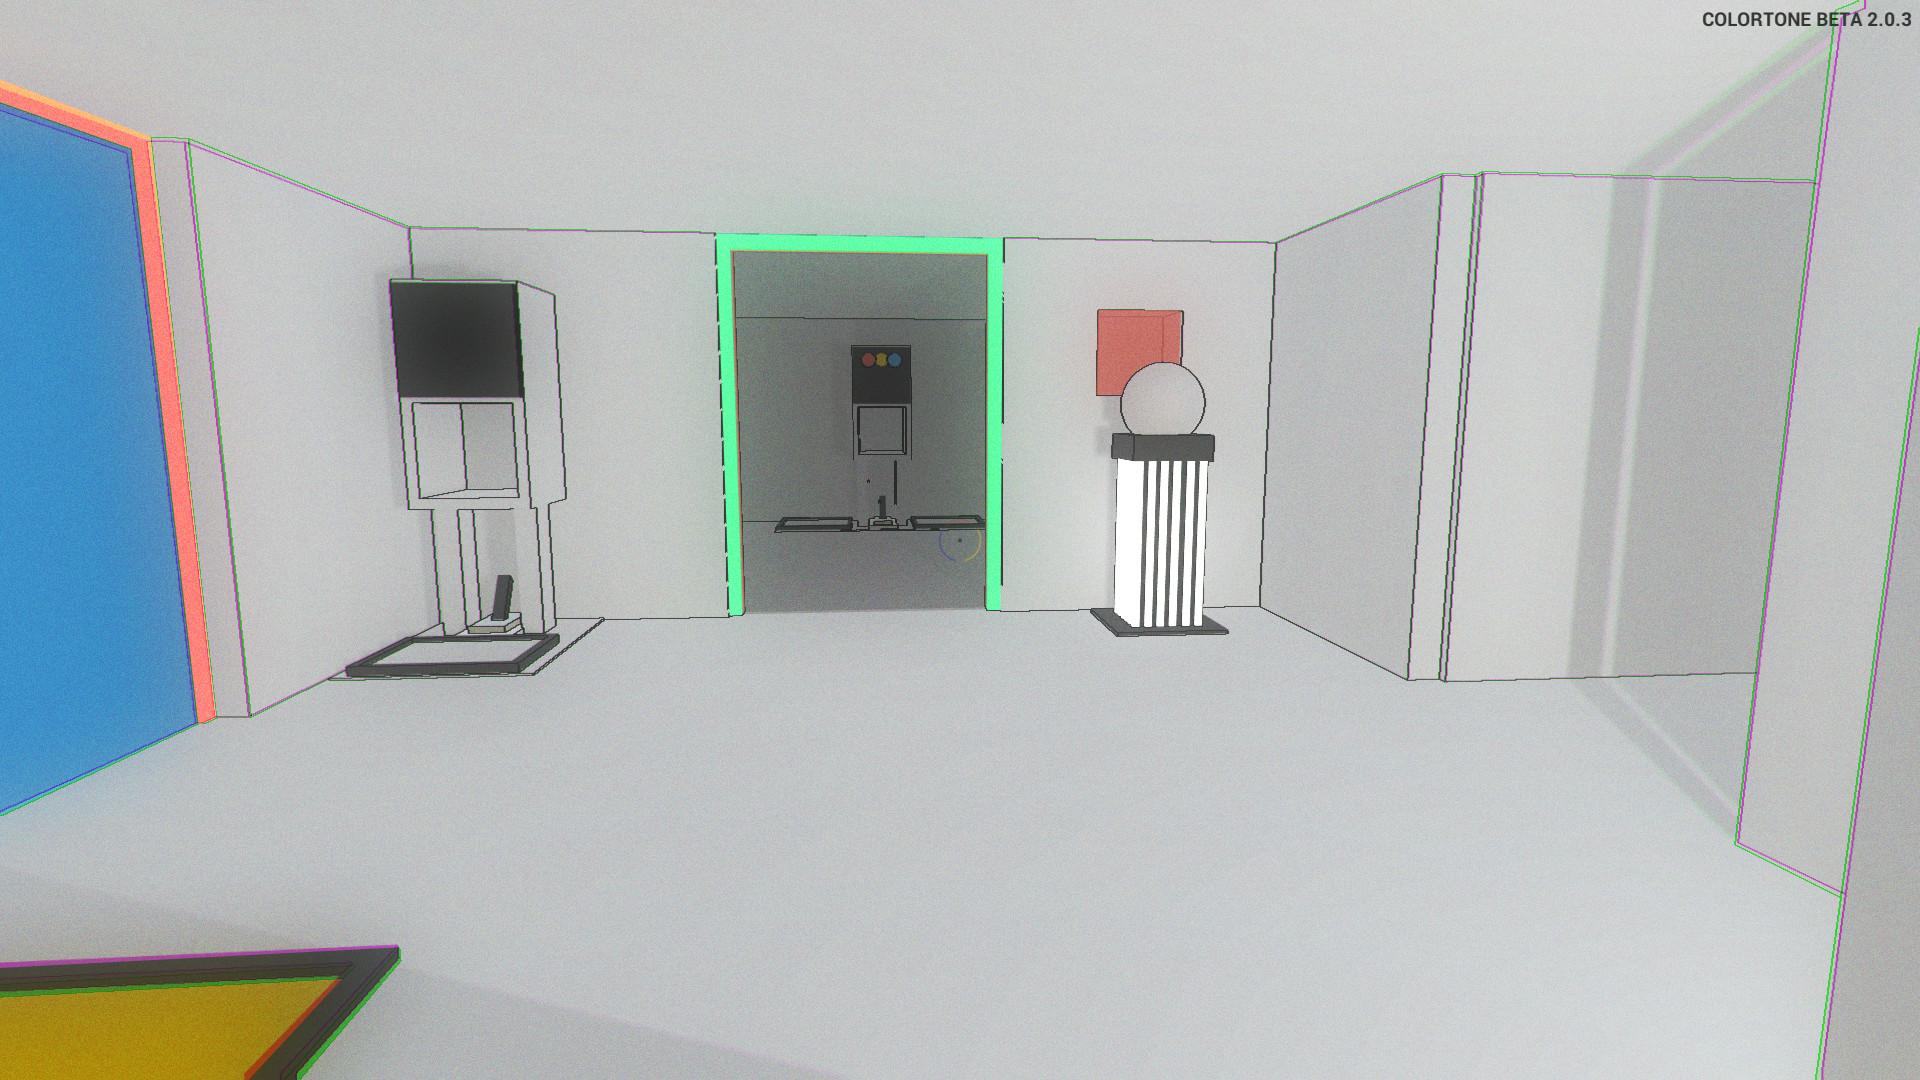 Colortone screenshot